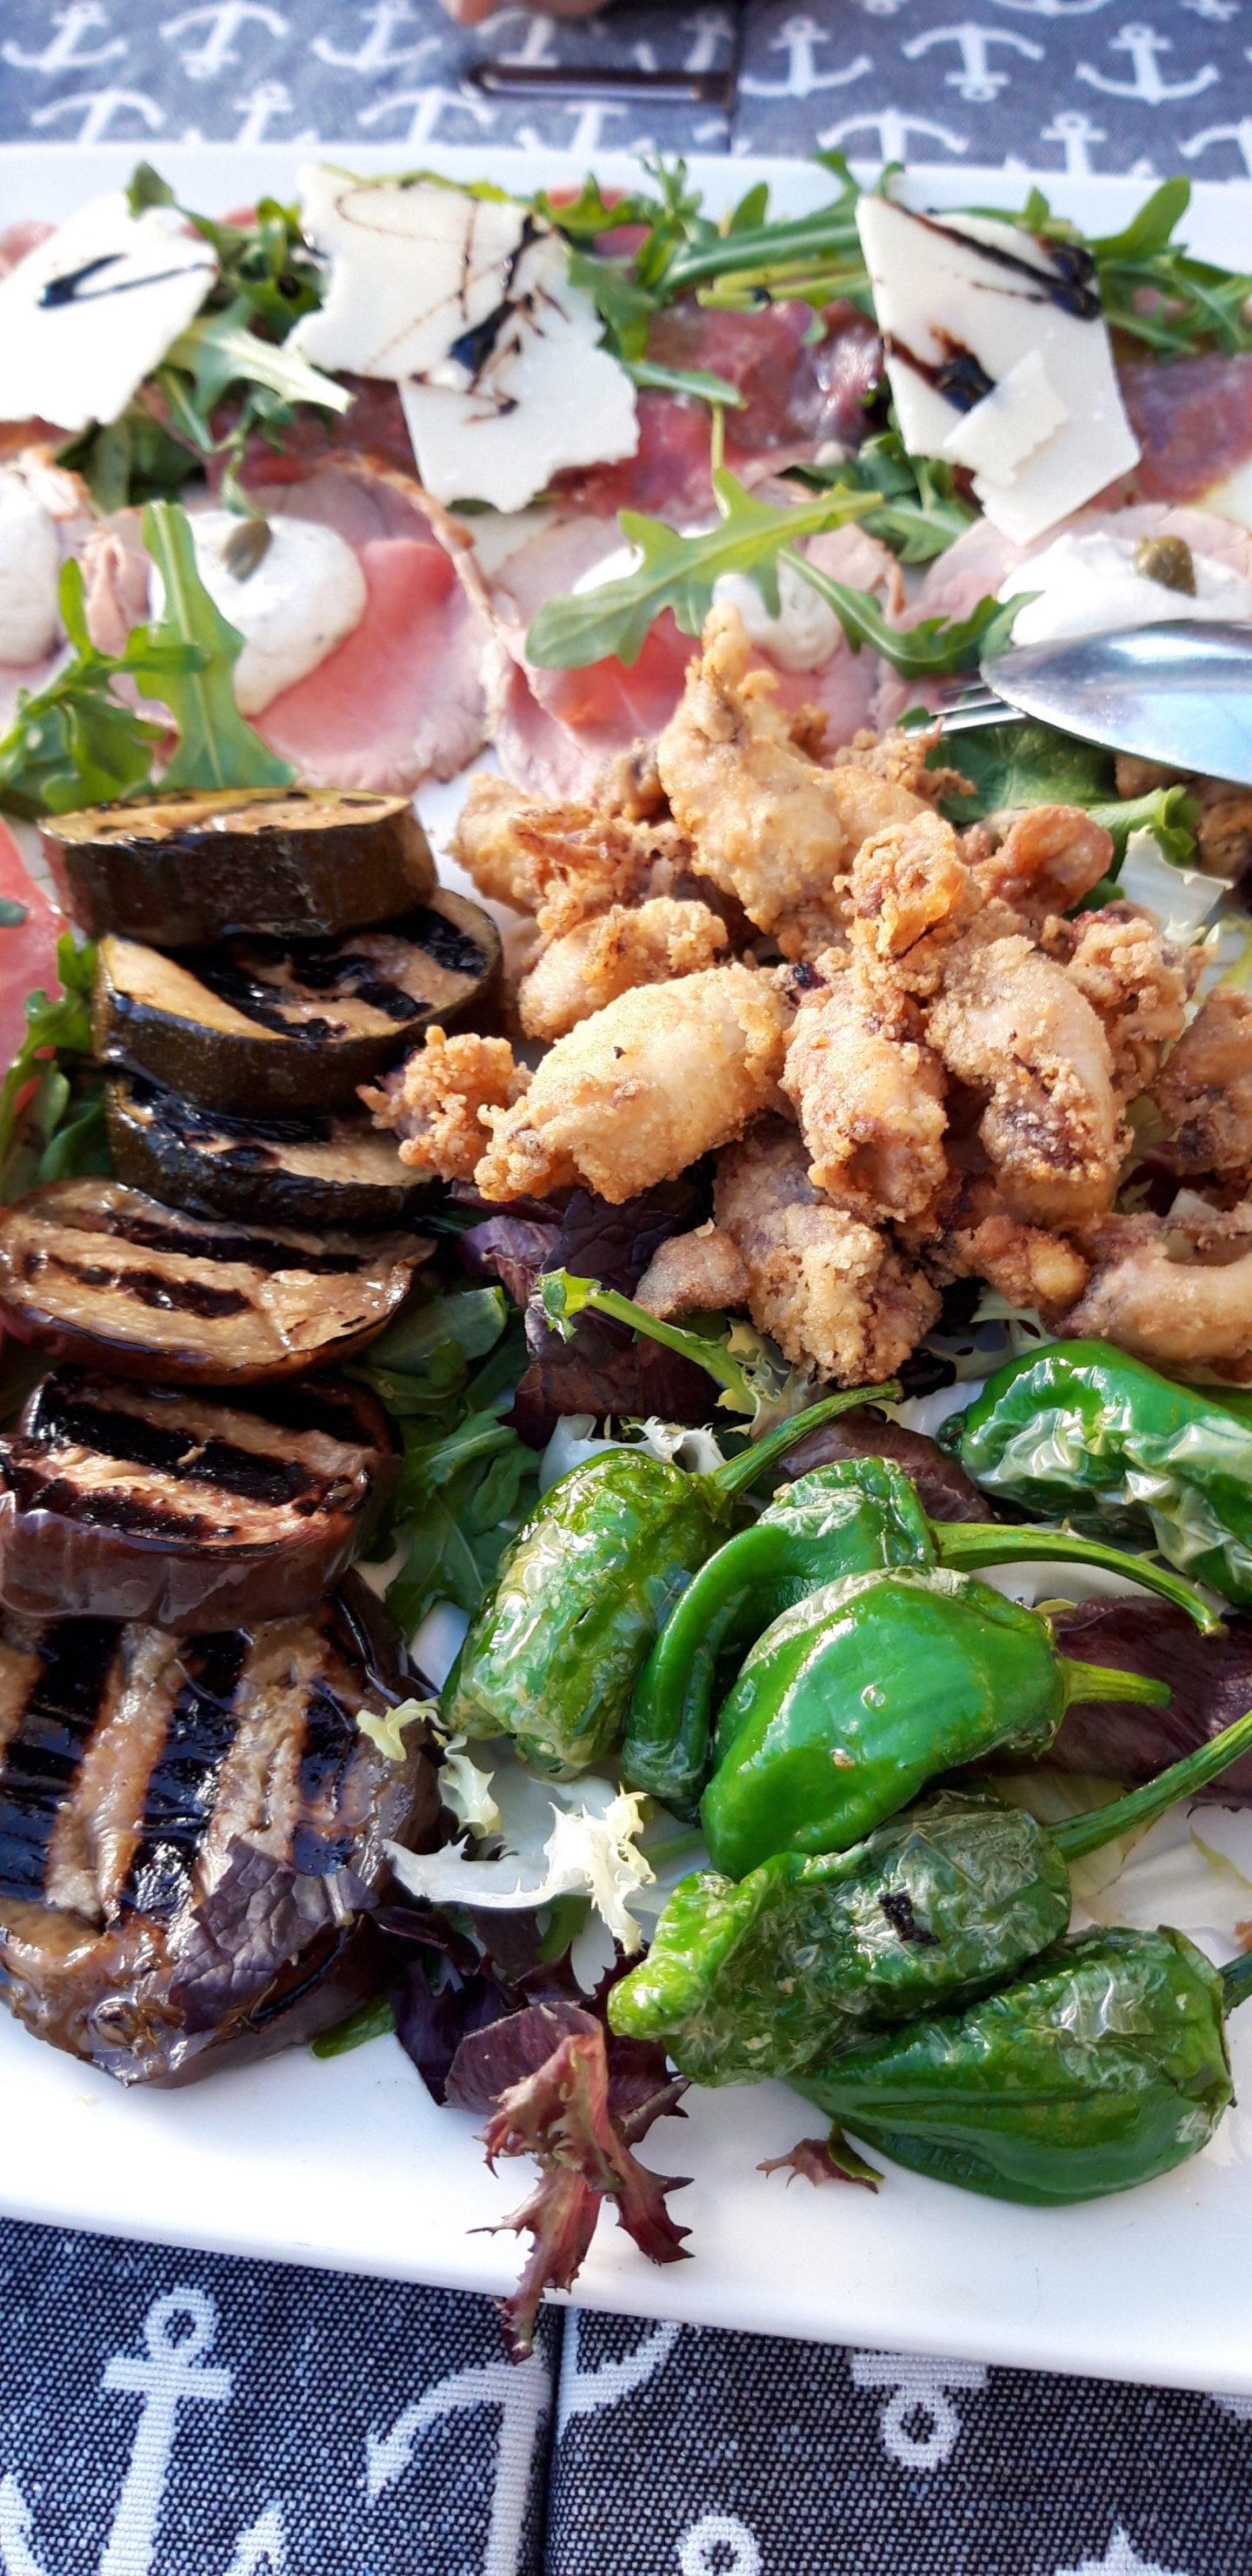 Erfahrung Kritik Bewertung Vorspeisenplatte Restaurant Almare Ciutat Jardi Palma de Mallorca Foodblog Sternestulle